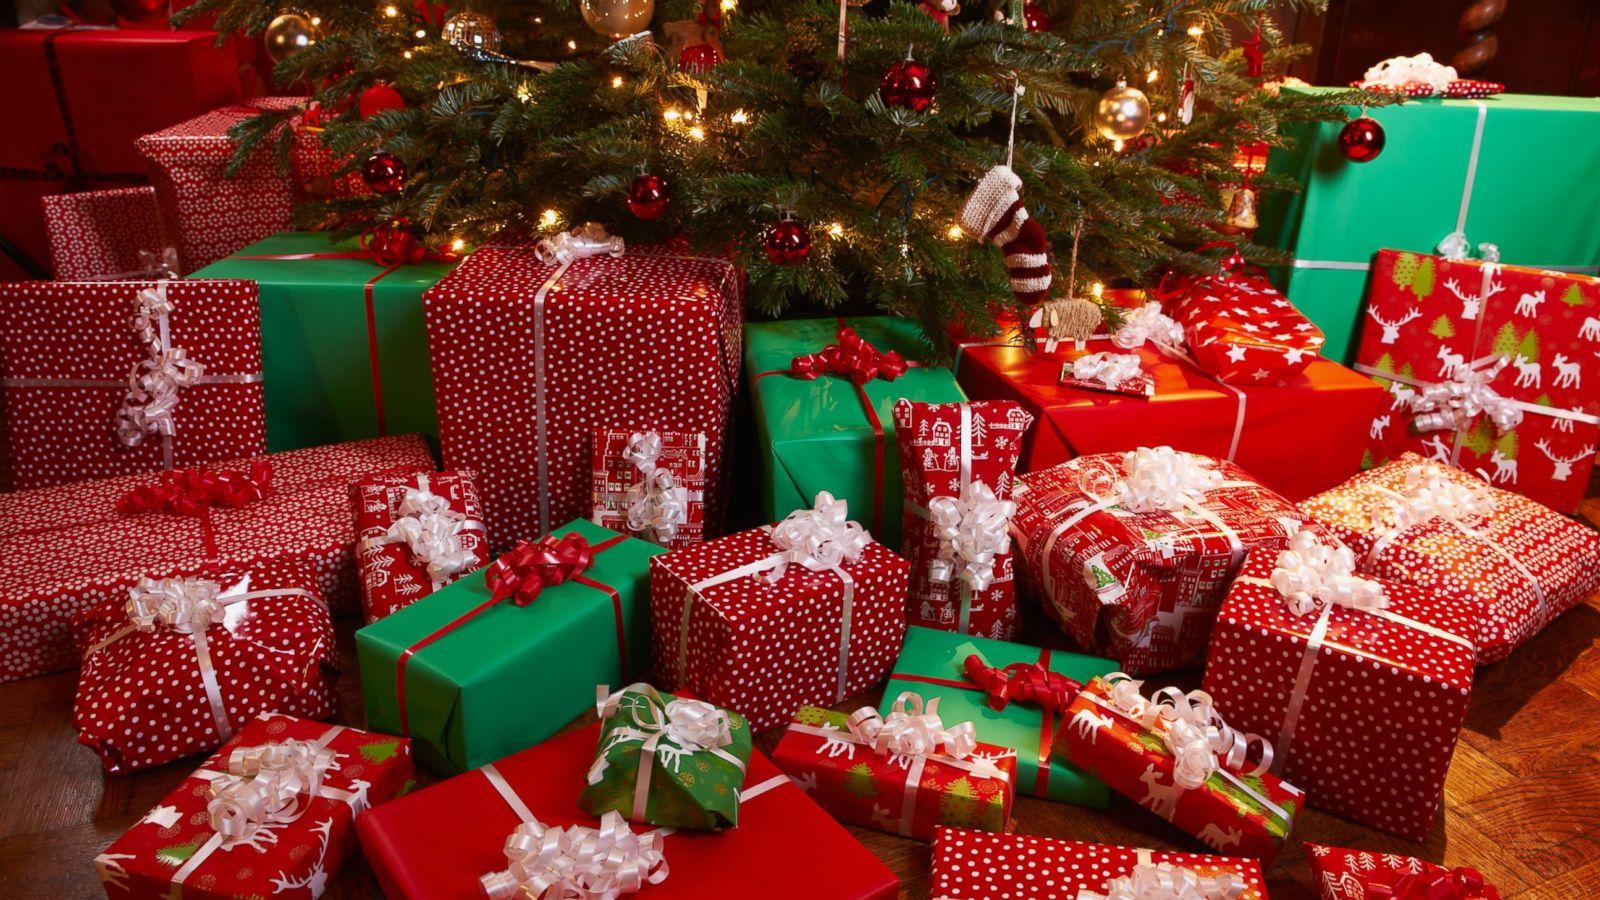 Better Business Bureau Warns of Illegal Online \'Secret Sister Gift ...